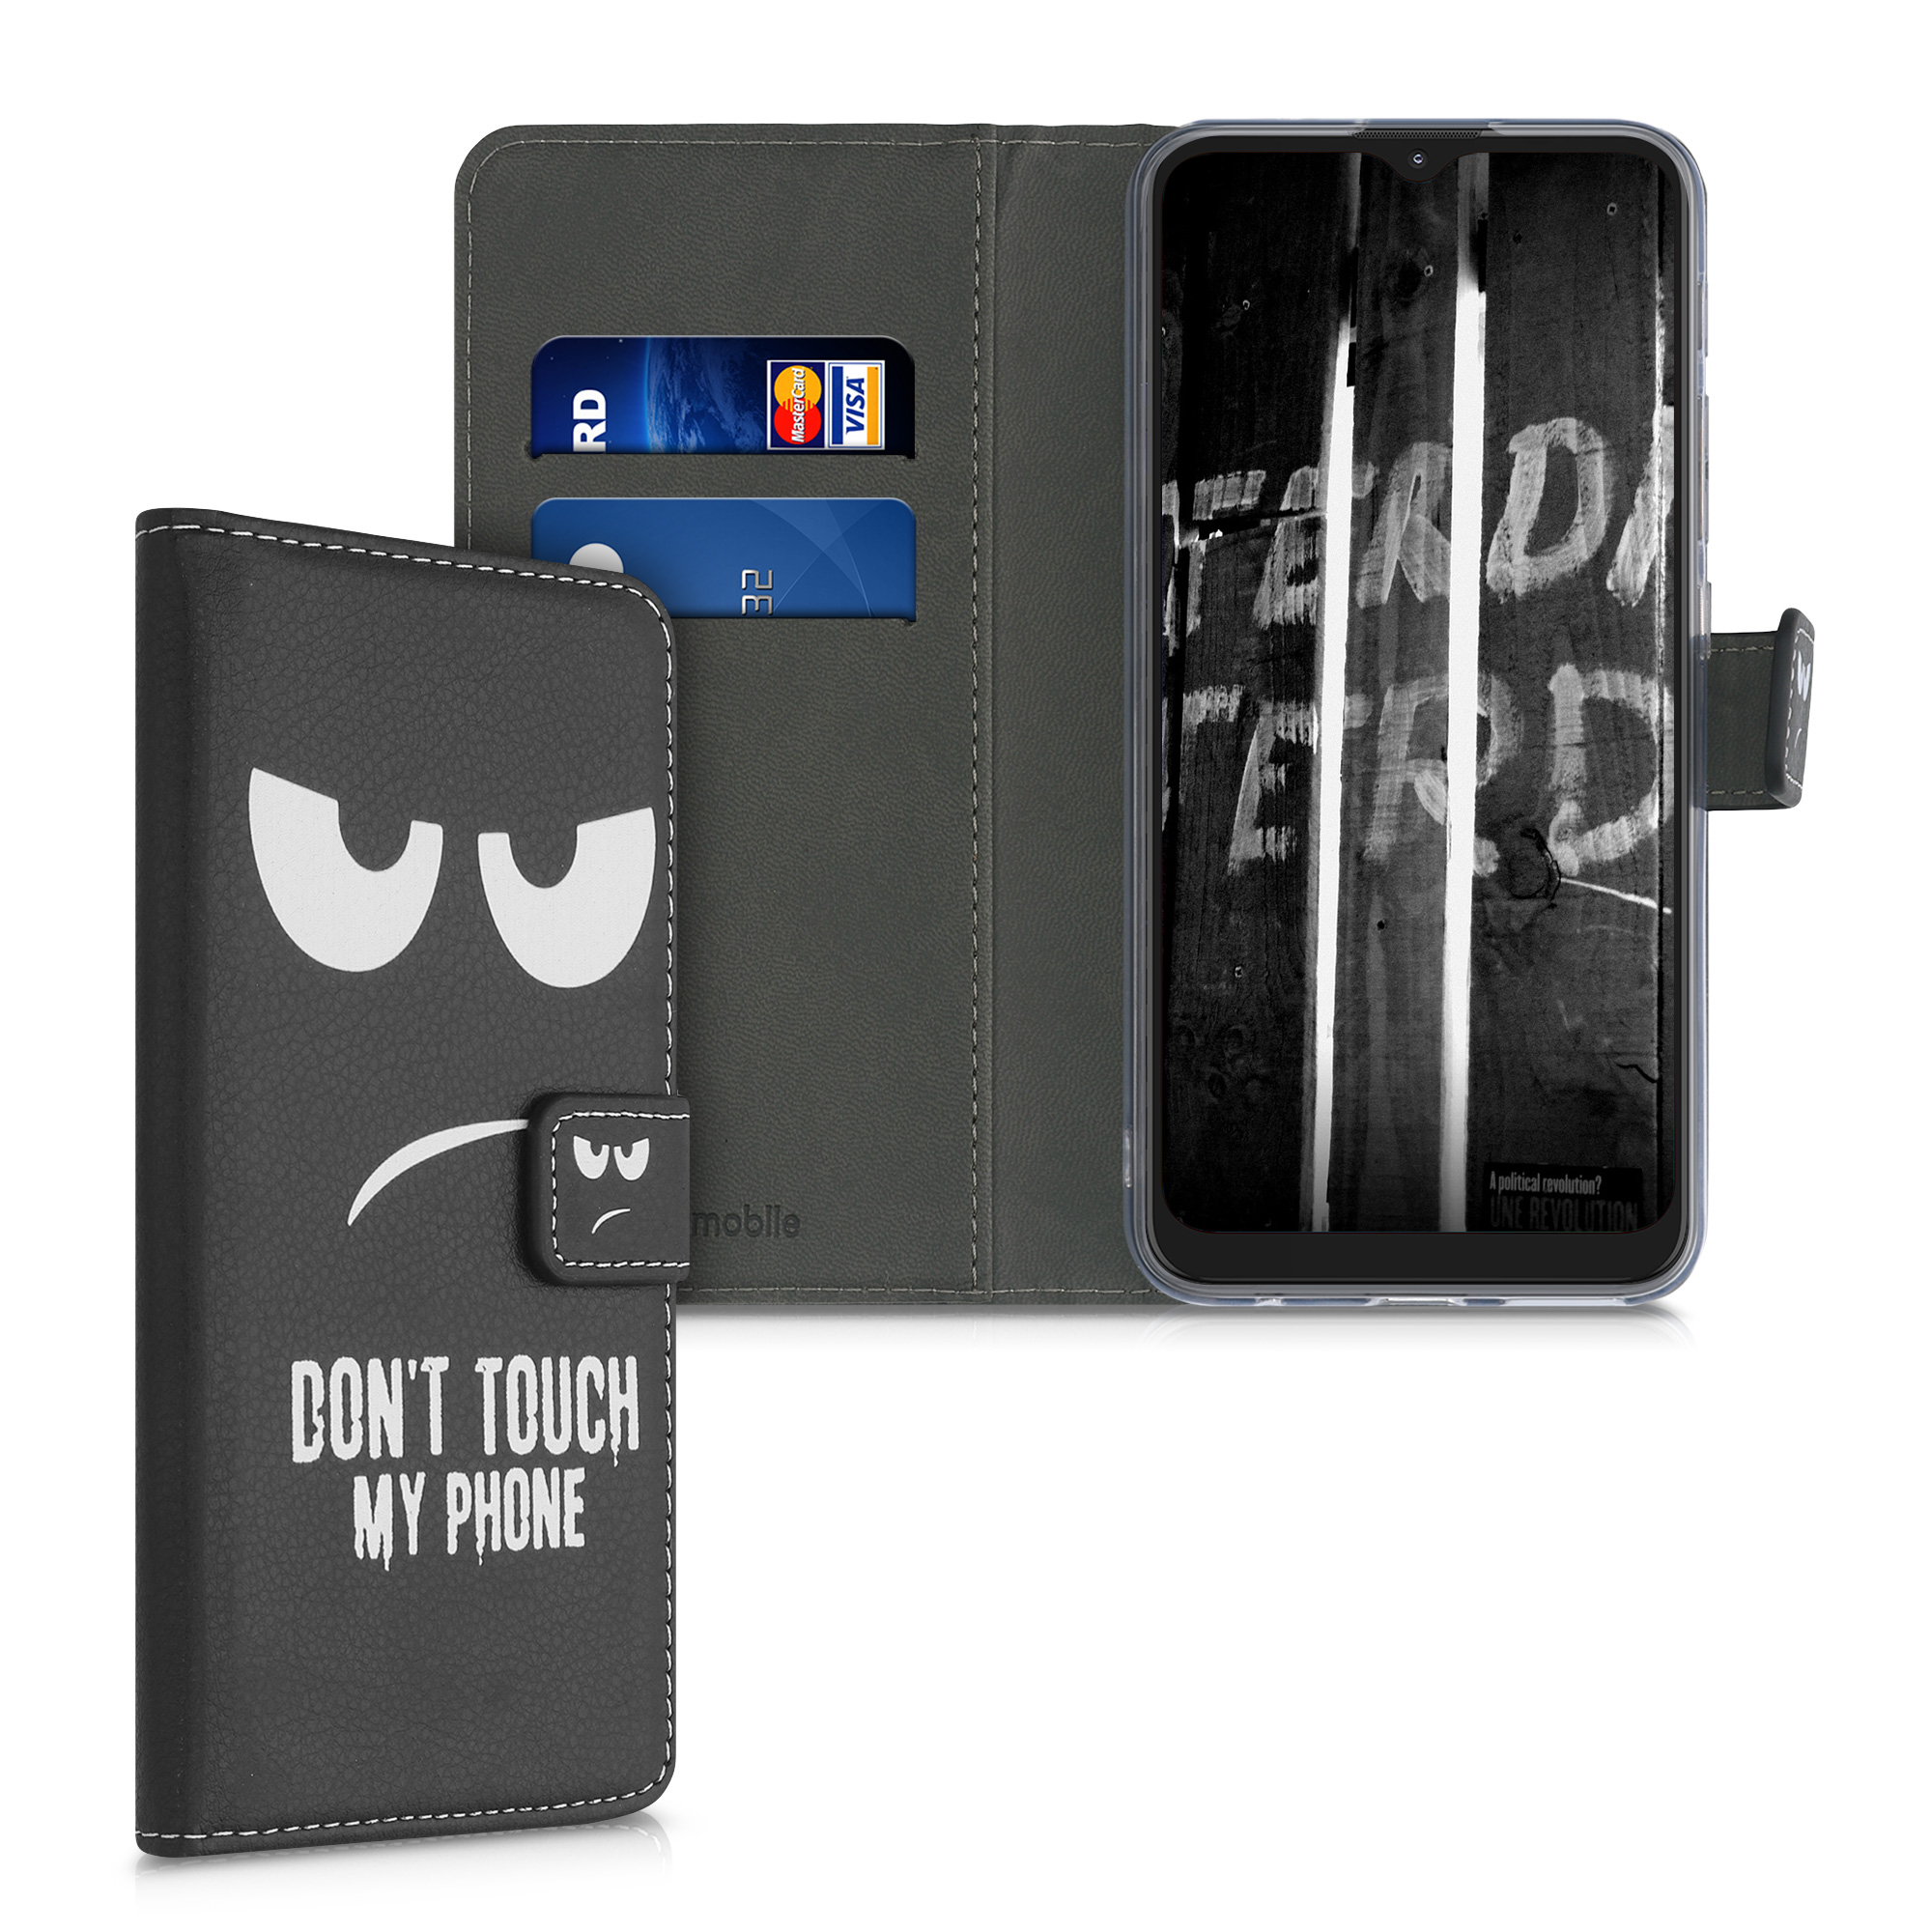 Kožené pouzdro   obal pro Motorola Moto G9 Play / Moto E7 Plus - Nedotýkej se mého telefonu Bílá / Černá